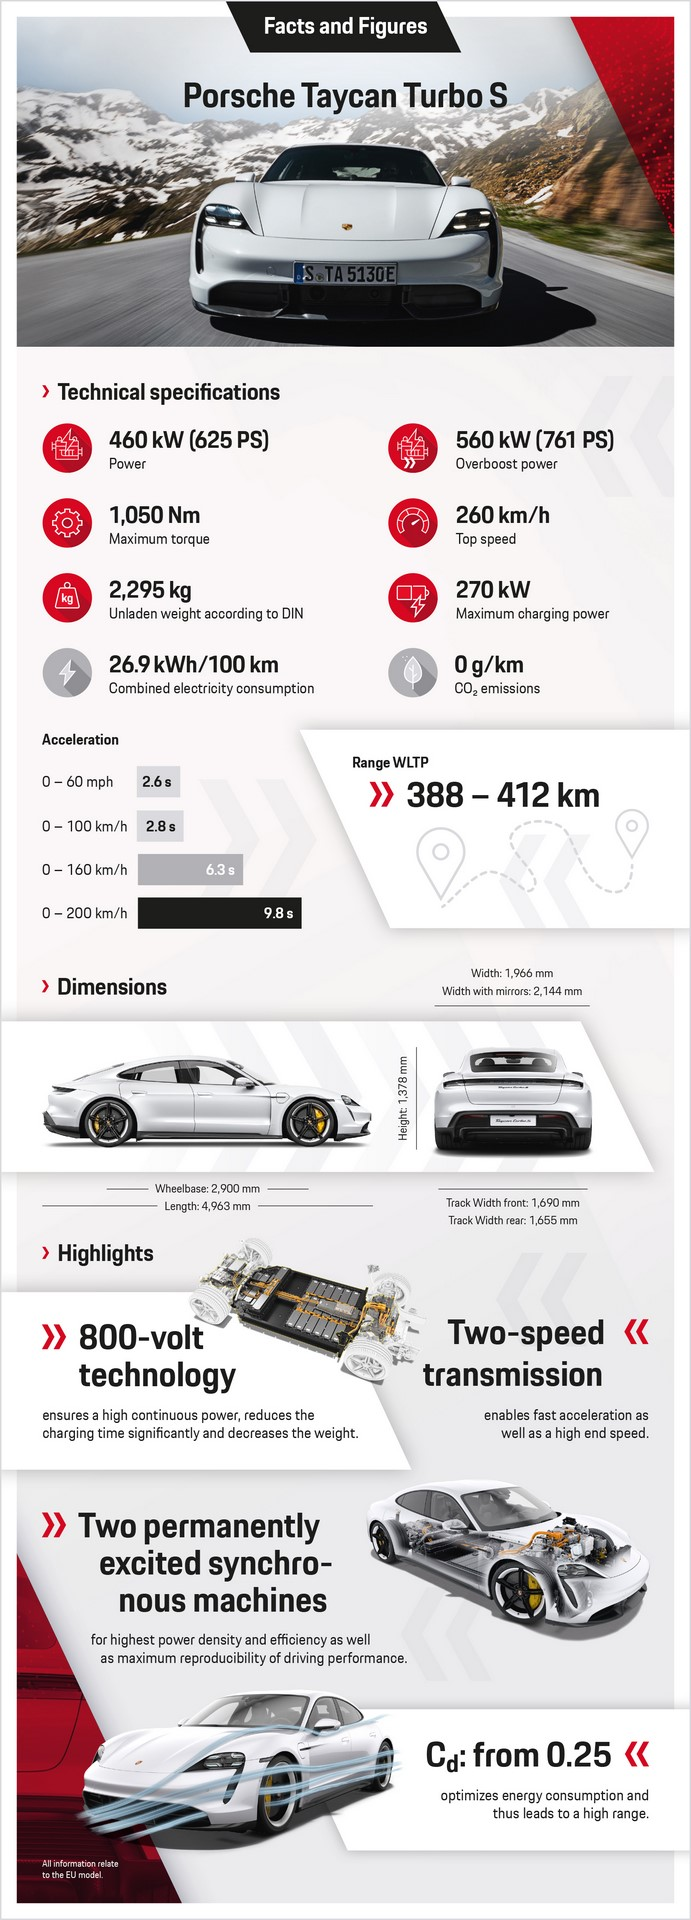 03.09.2019_PORSCHE_Infografik_Taycan_Turbo_S_v4.indd